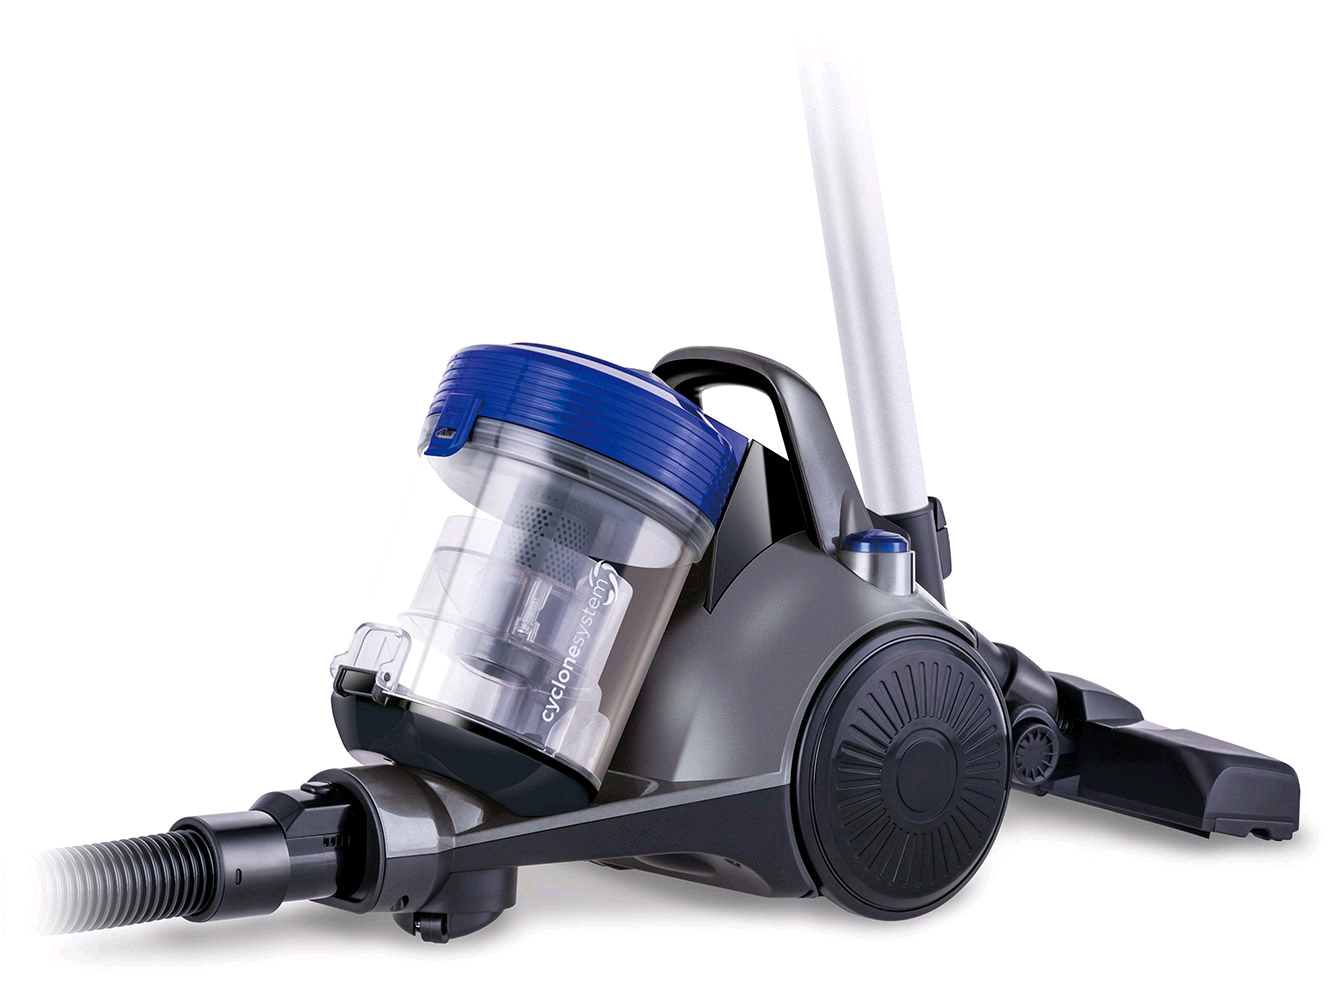 Swan Eureka MultiClean Bagless Cylinder Vacuum 700w